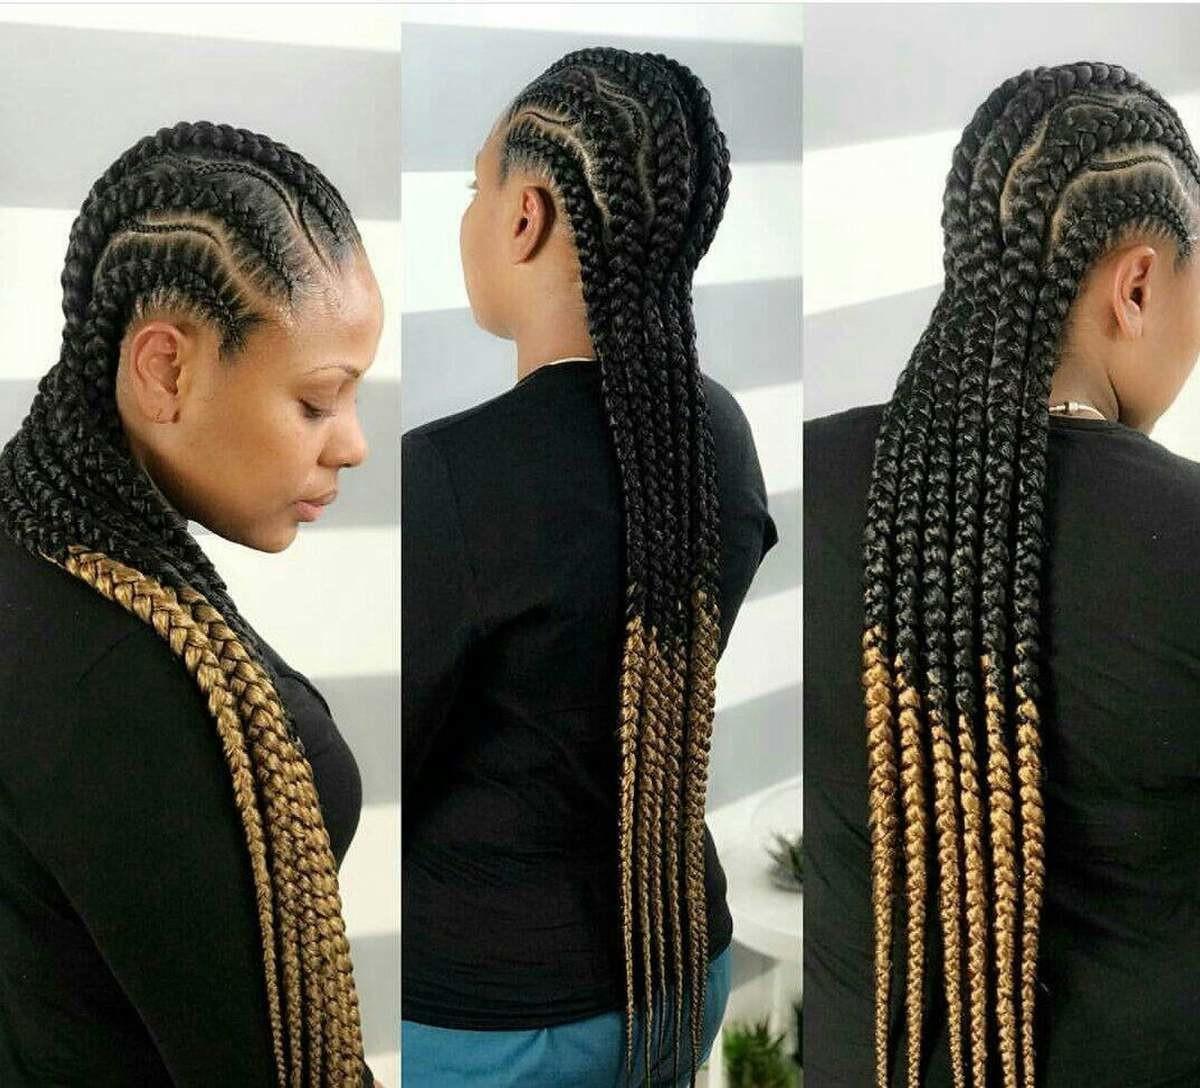 Braided Wig Cornrow Wig Ghana Weaving Wig By House Of Sarah